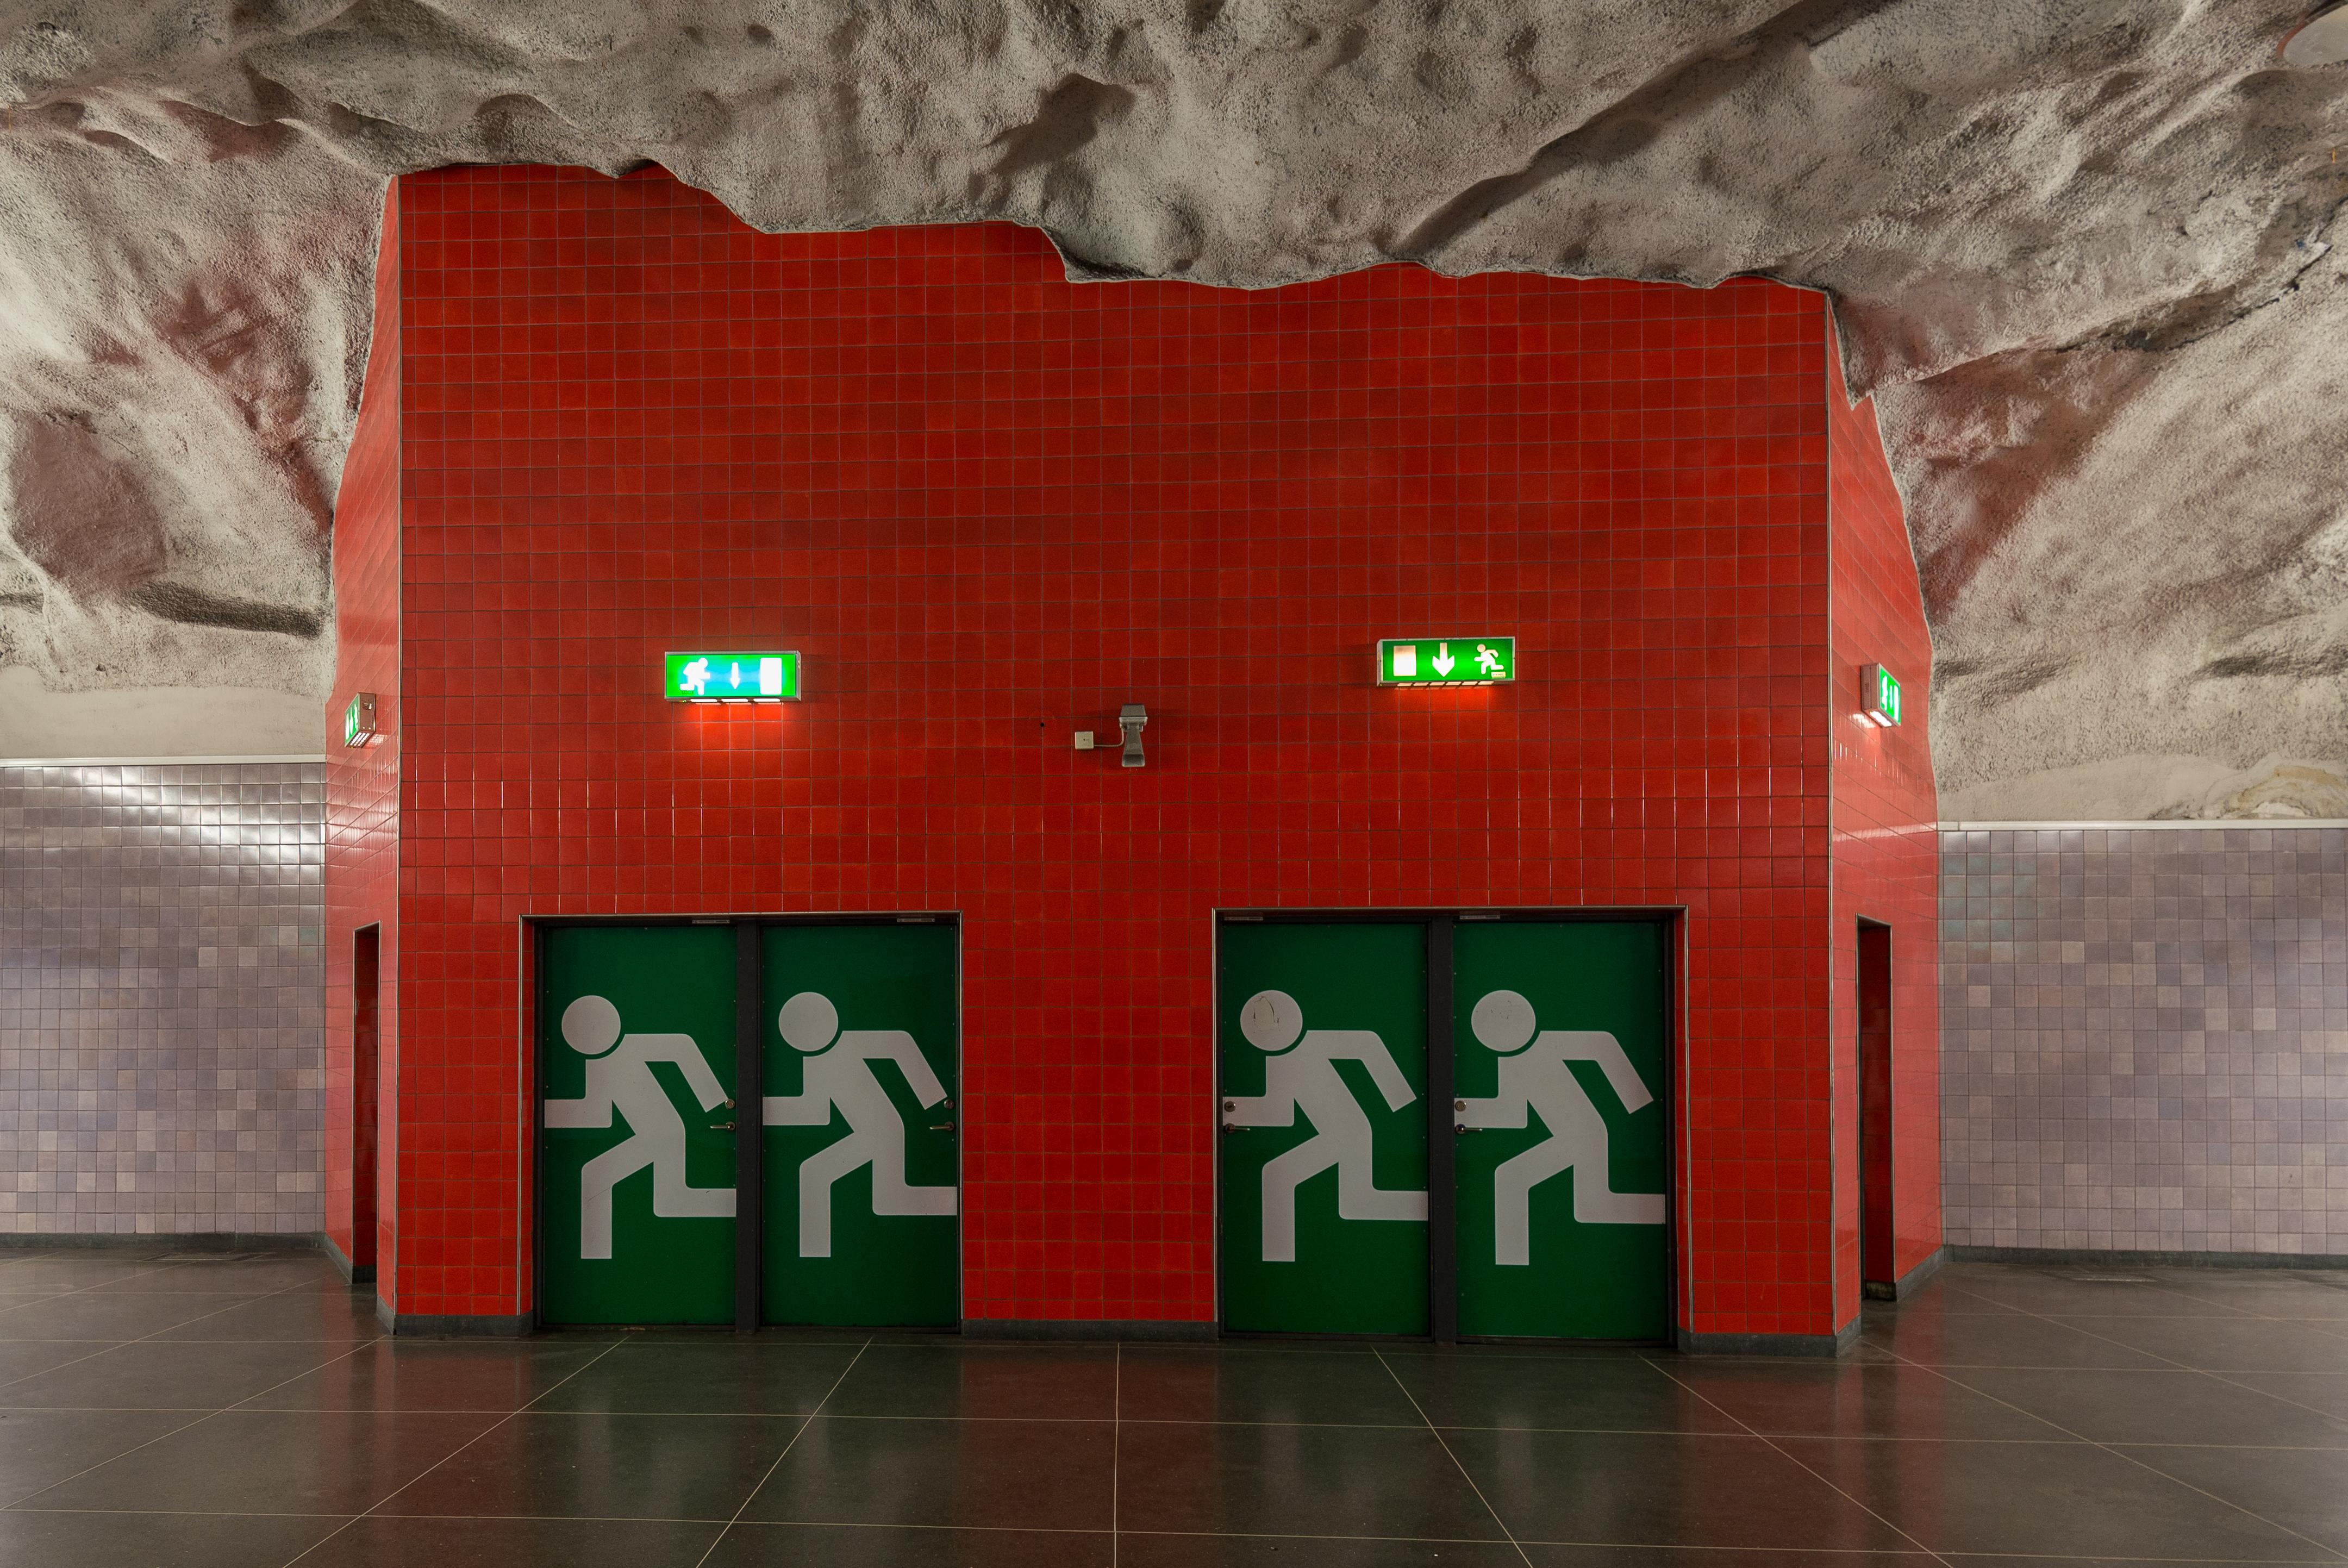 Emergency exit - Wikipedia